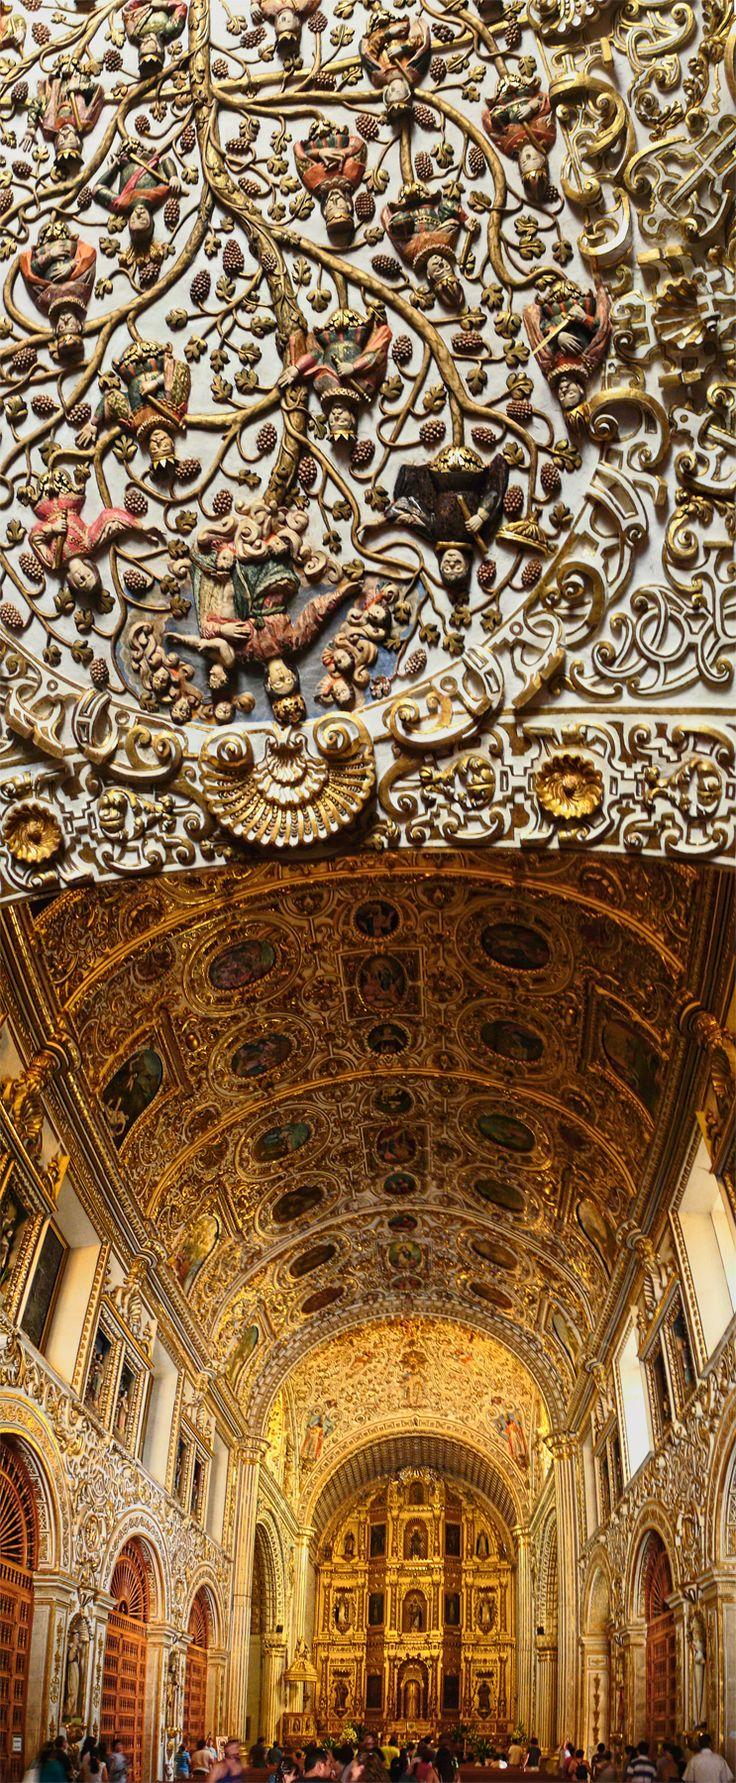 The amazing plaster entry to the Iglesia de Santo Domingo, Oaxaca, México